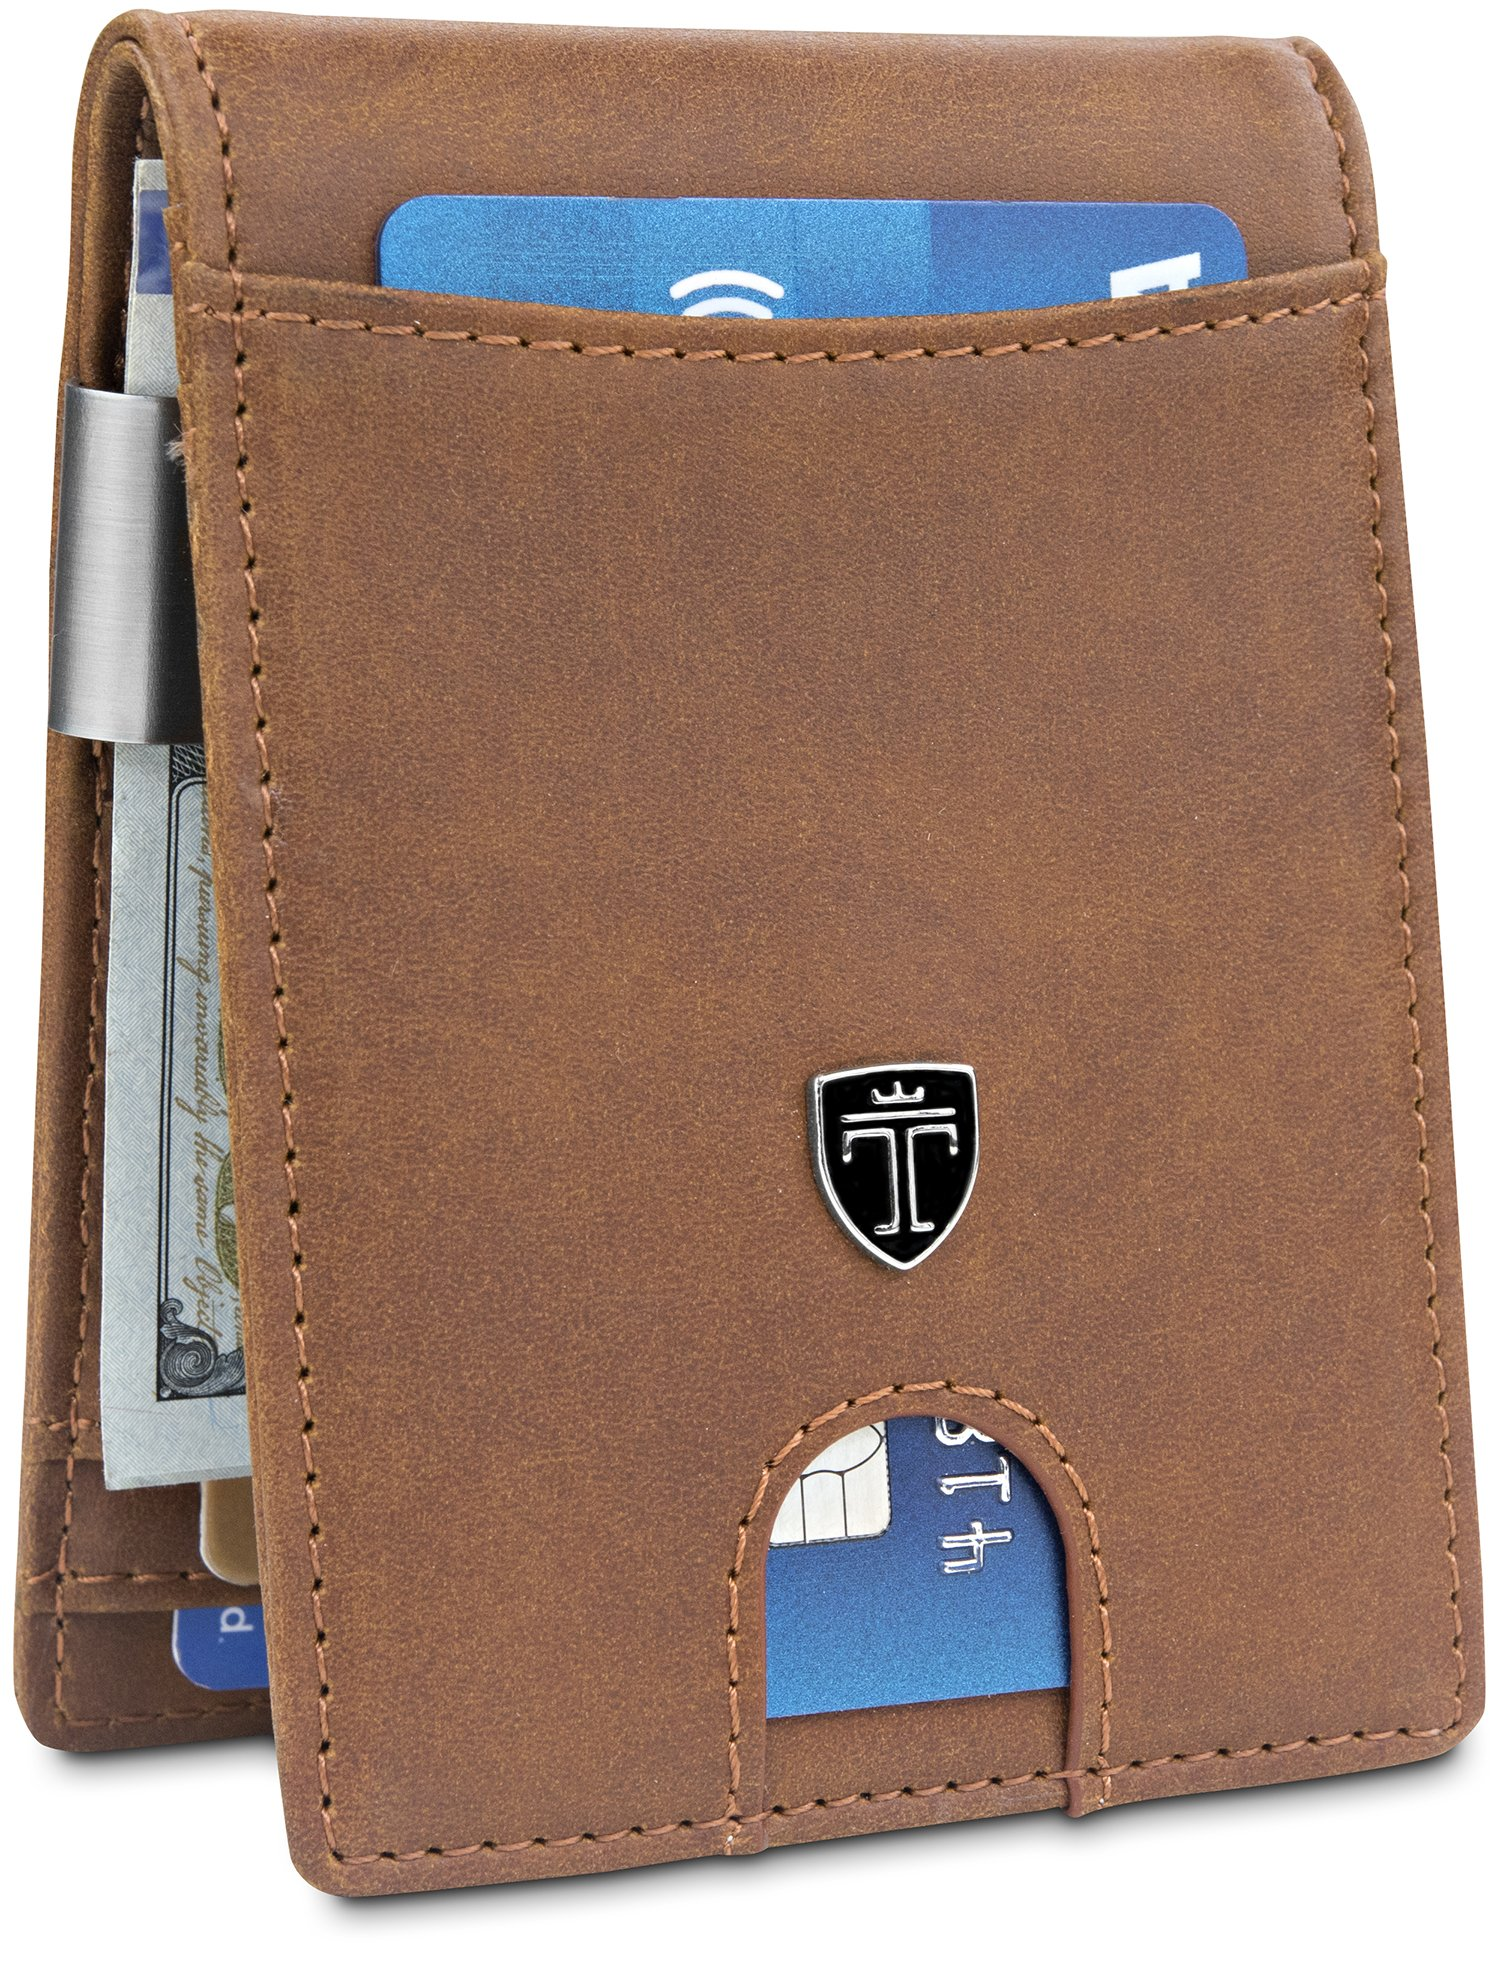 Money Clip Wallet''HOUSTON'' Mens Wallet RFID Blocking Credit Card Holder | Travel Wallet | Minimalist Mini Slim Wallet Bifold for Men with Gift Box TRAVANDO